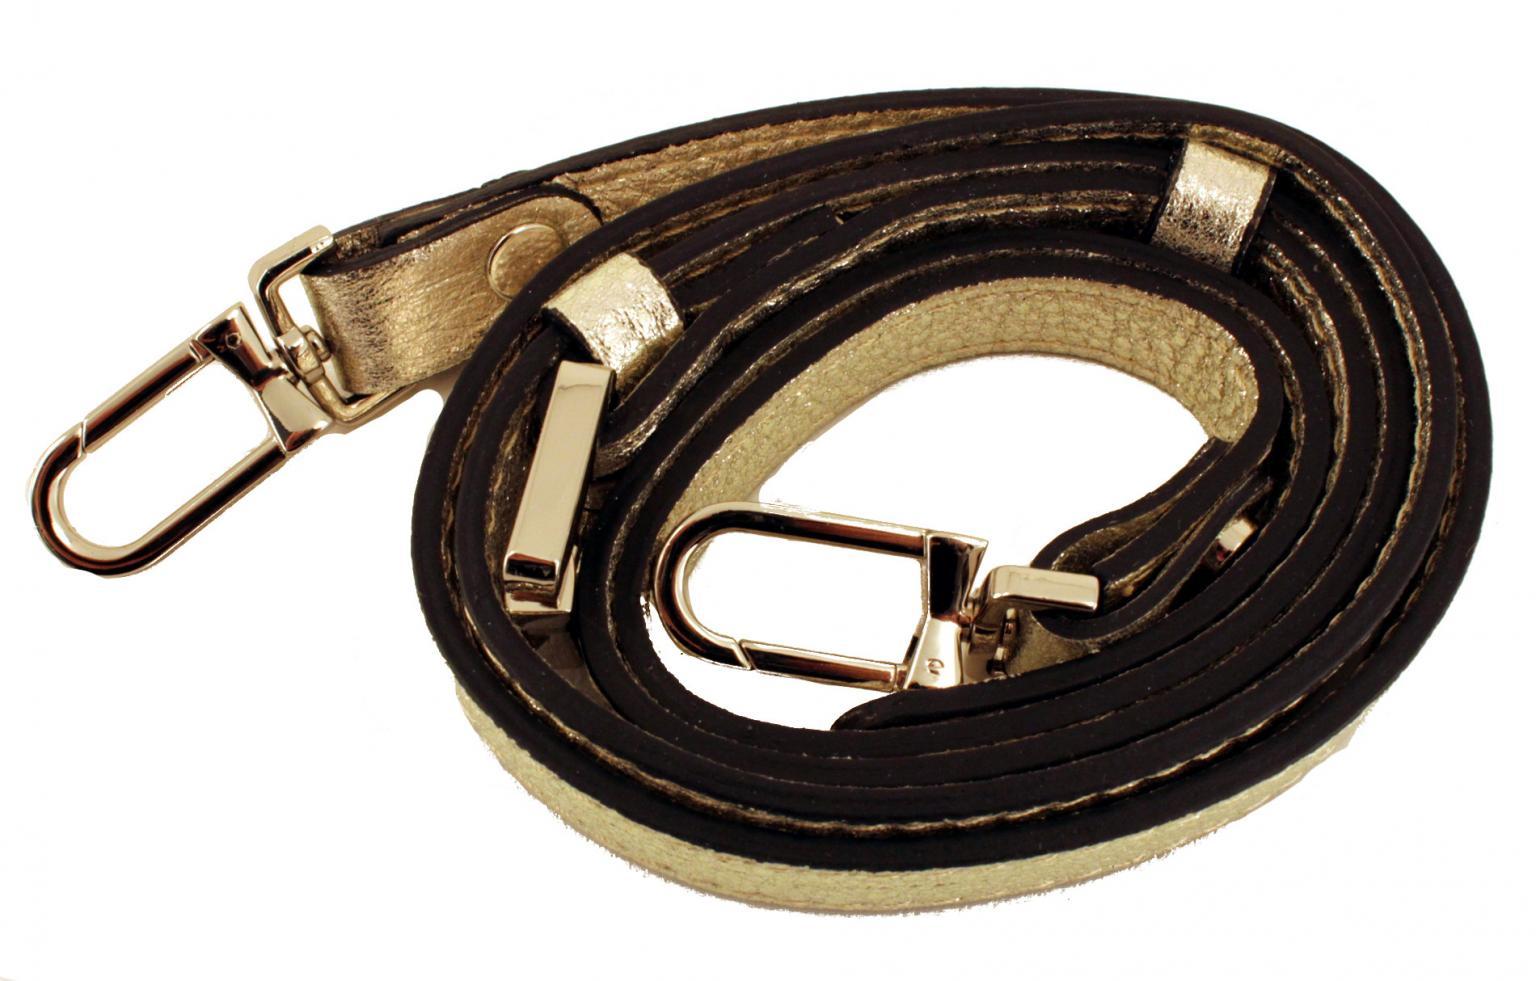 Gianni Chiarini Ledertasche Reißverschluss glänzend silber